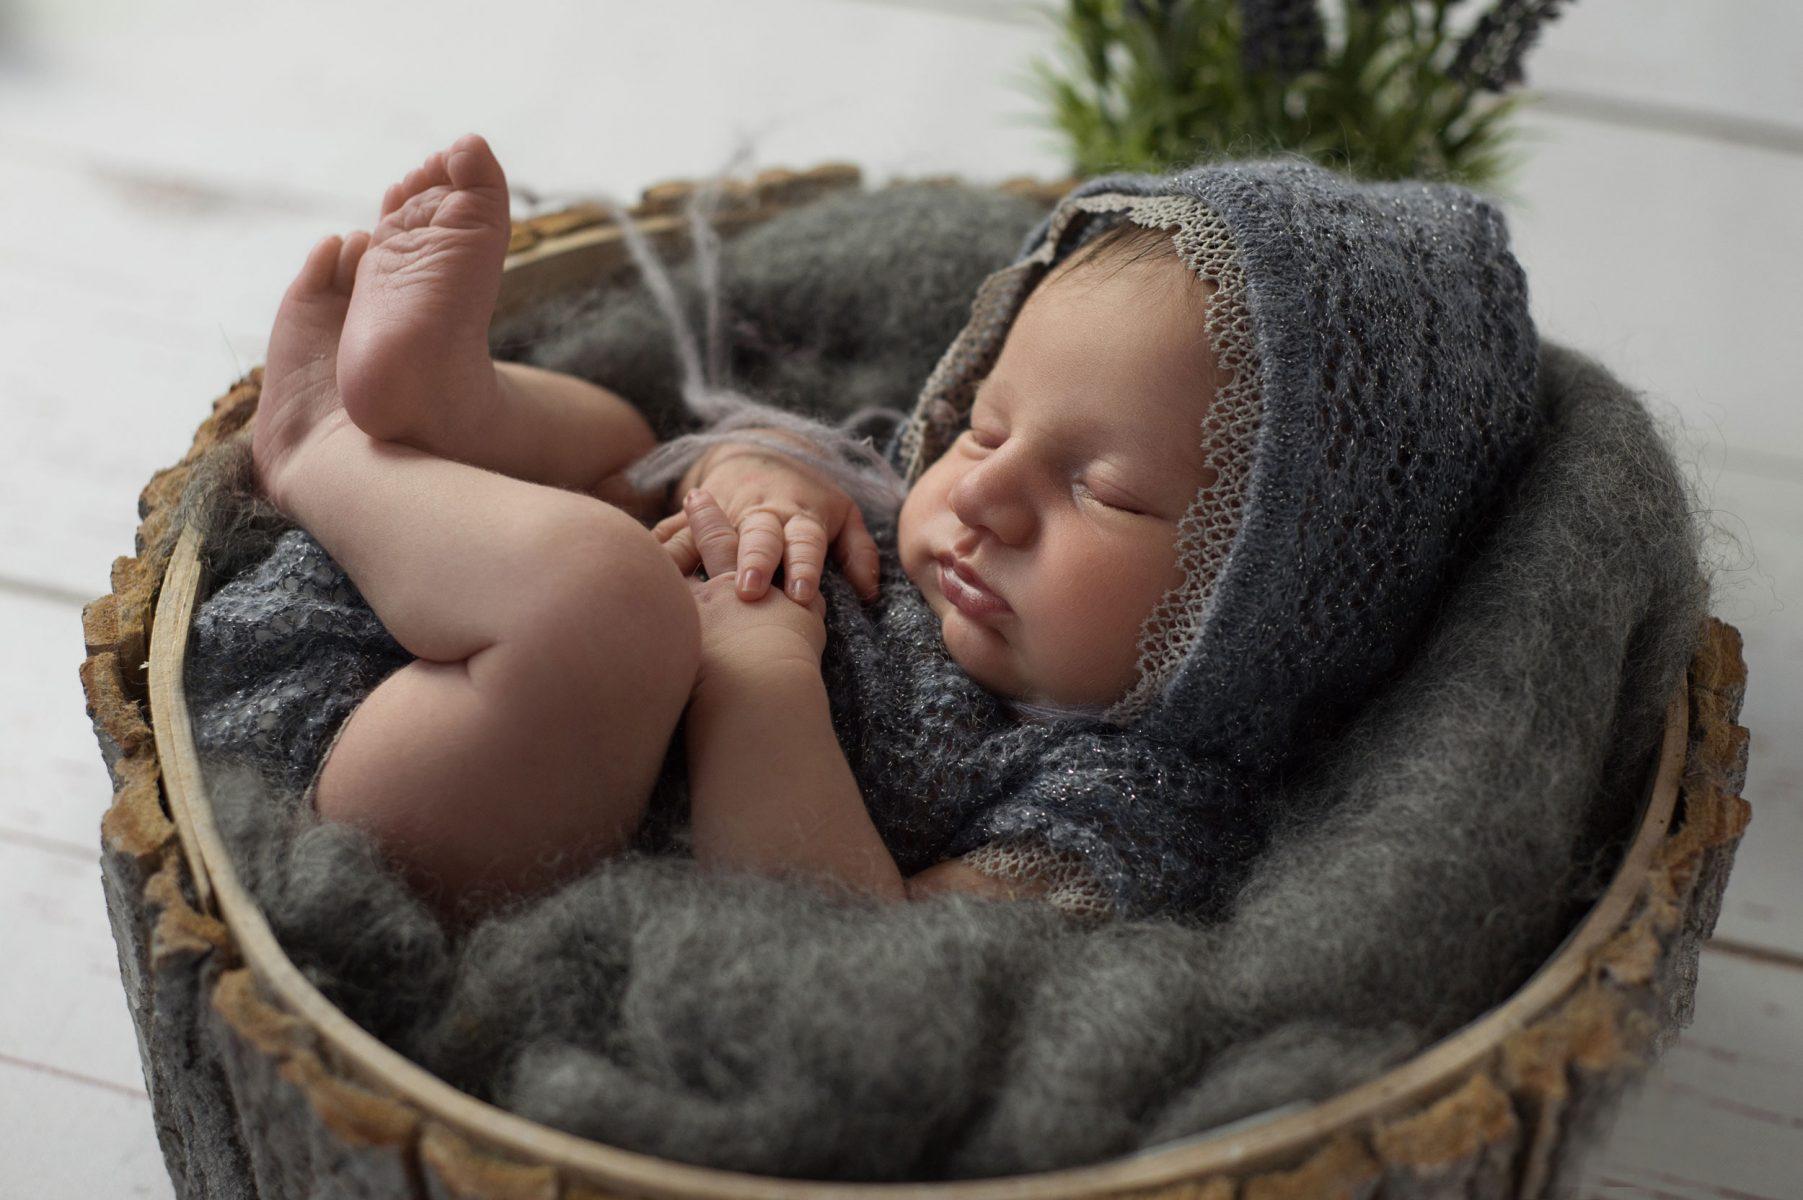 neugeborene newborn babyfotograf neugeborenefotograf newbornphotographer schwangerschaft maternity pregnancy schwangerschaftsfotograf luxembourg belgien schweiz